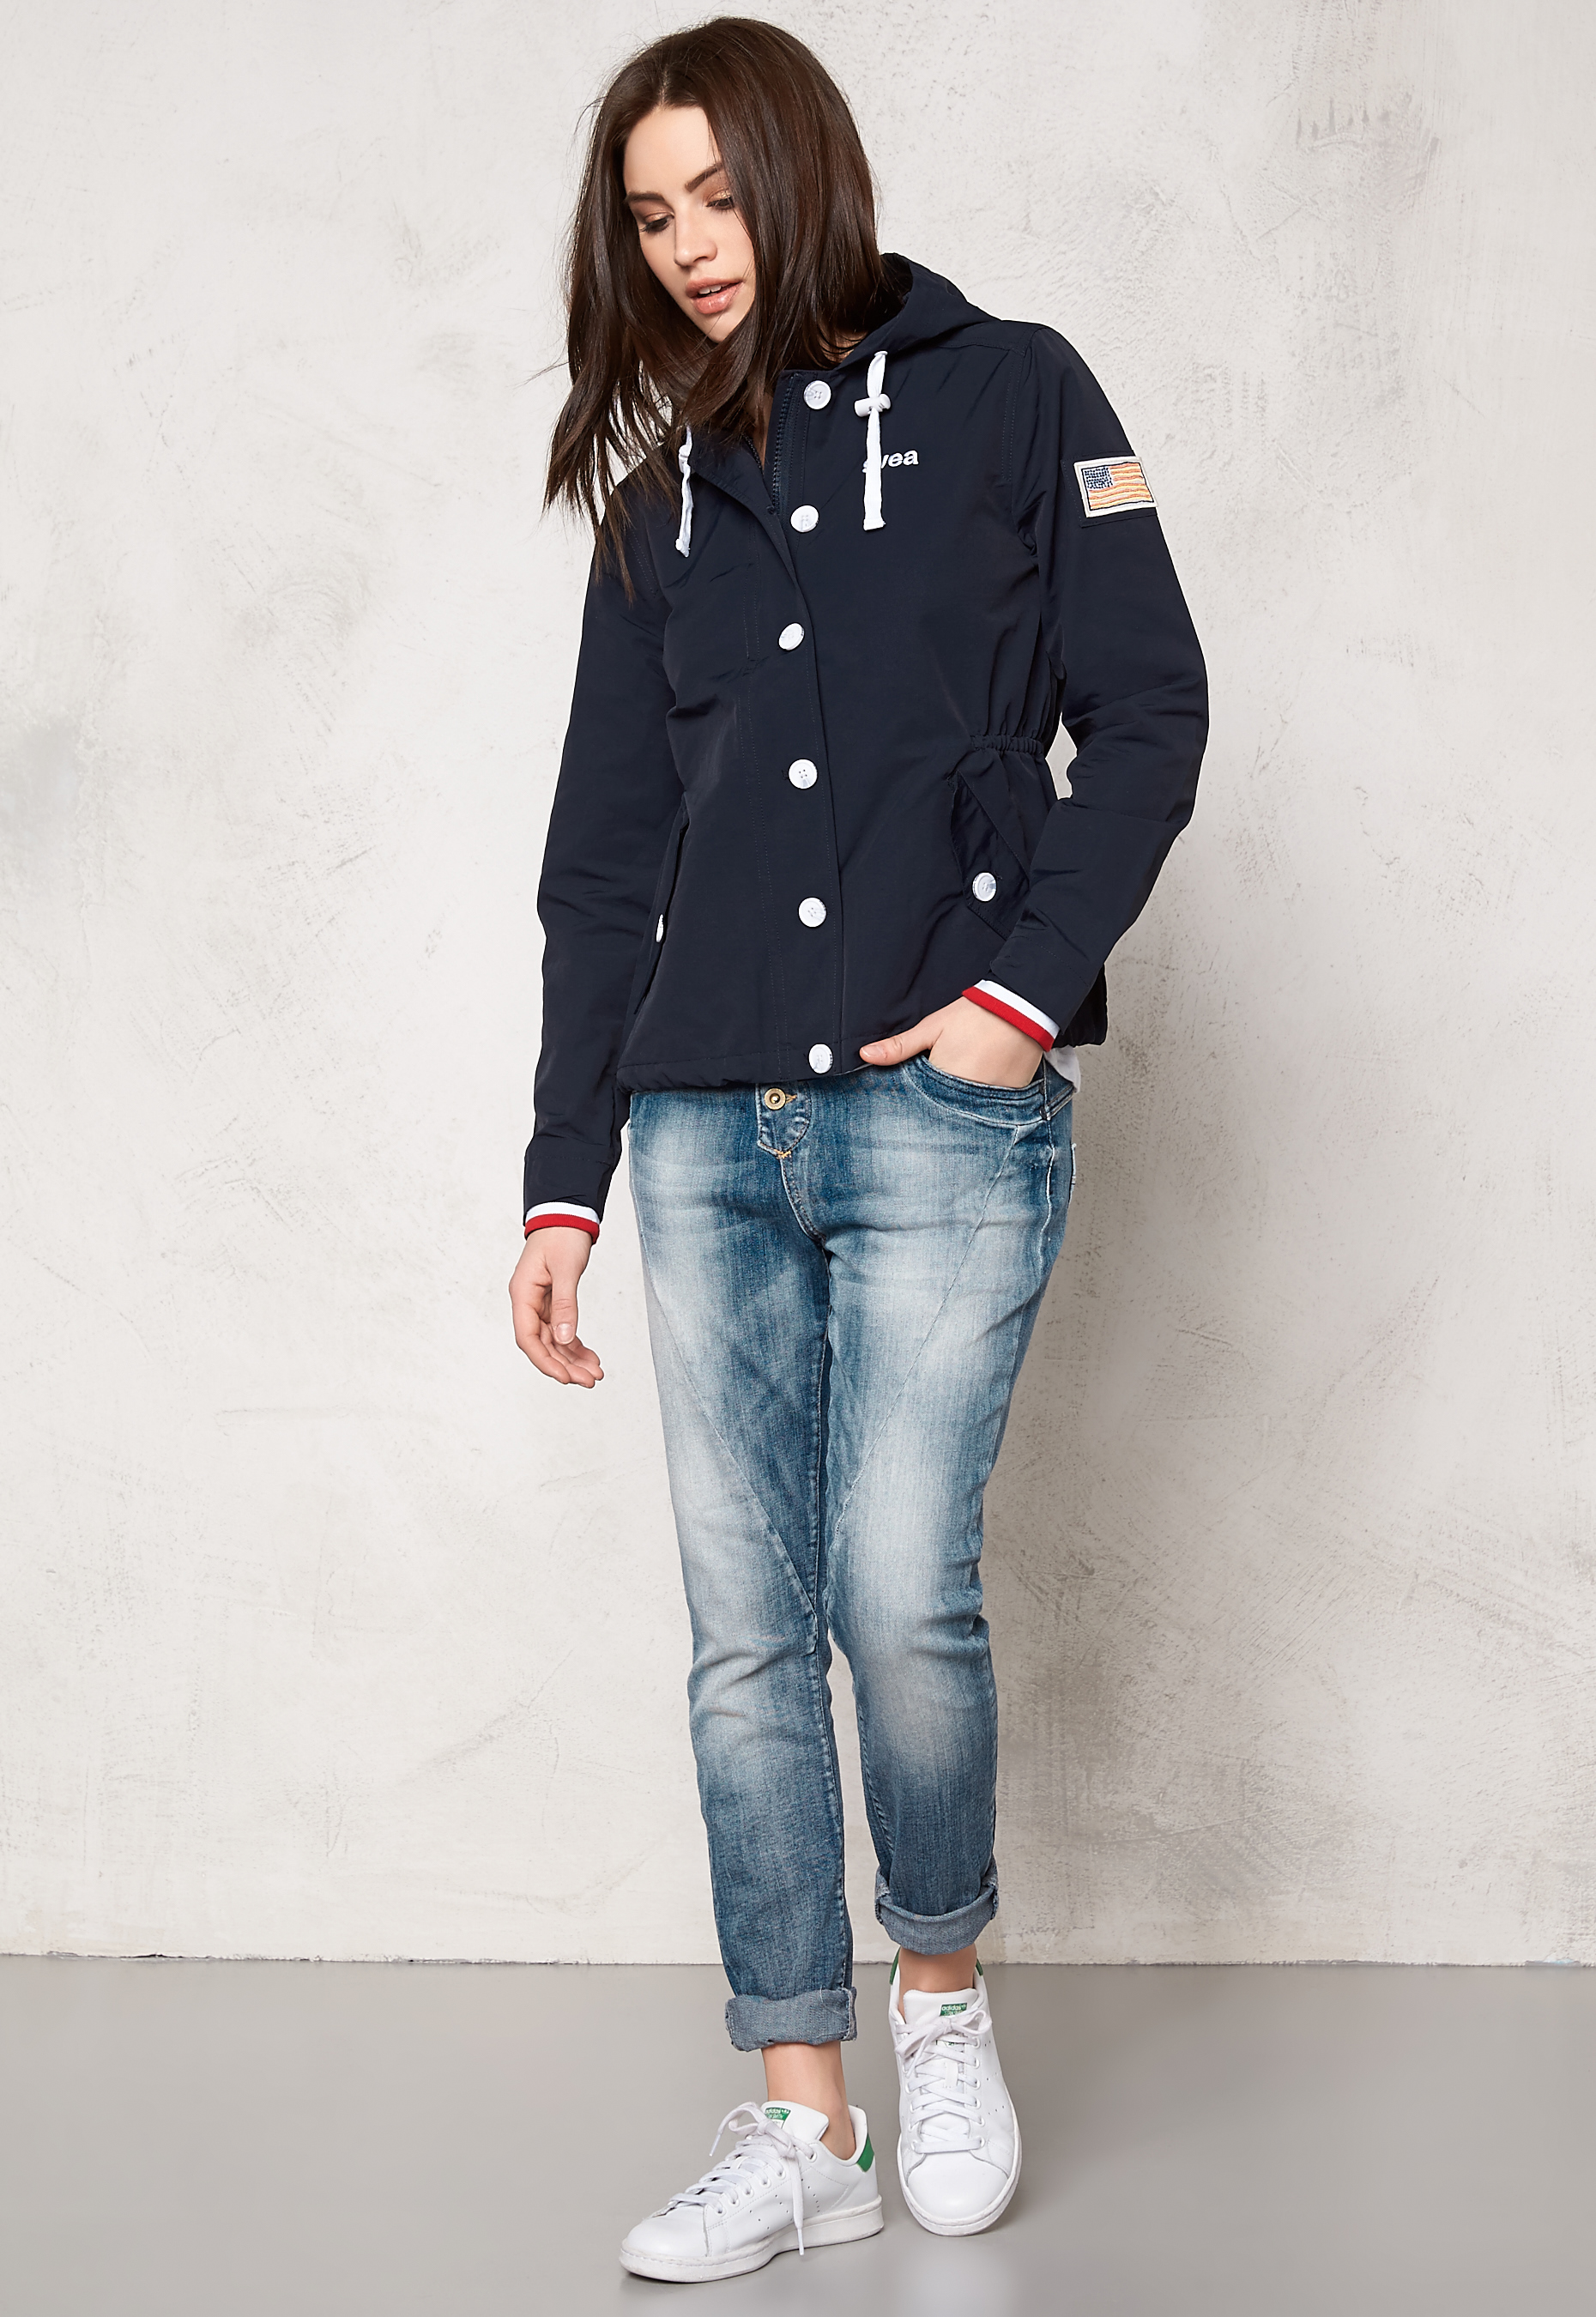 410d0823 Svea Doris Jacket Navy - Bubbleroom